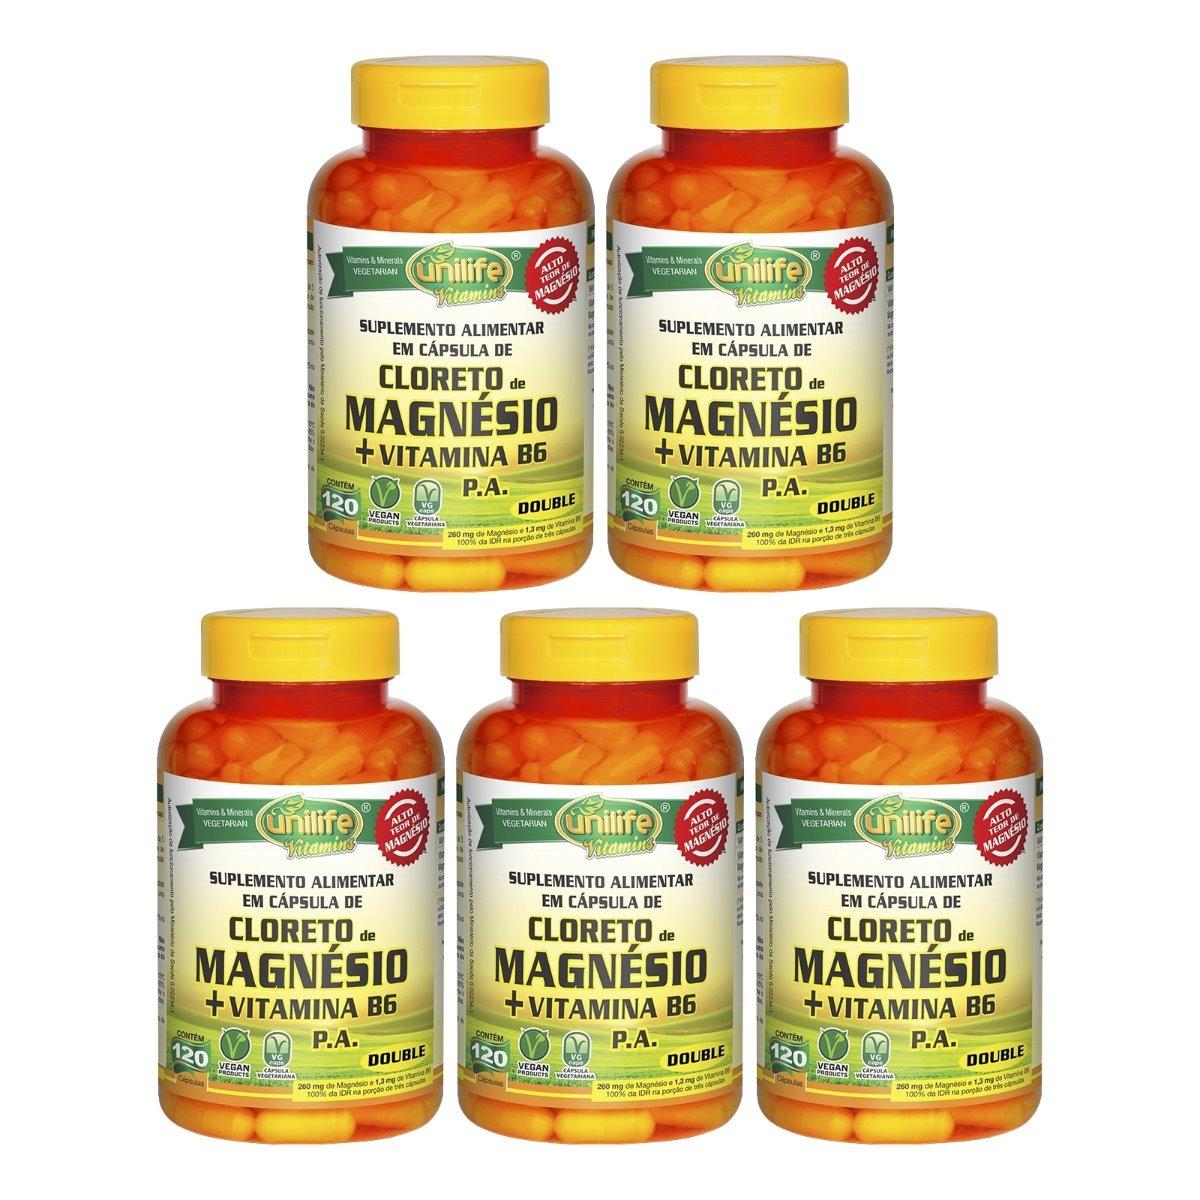 Cloreto De Magnésio P.A. + Vitamina B6 - 120 Cápsulas 800mg Unilife Kit 5 Unidades